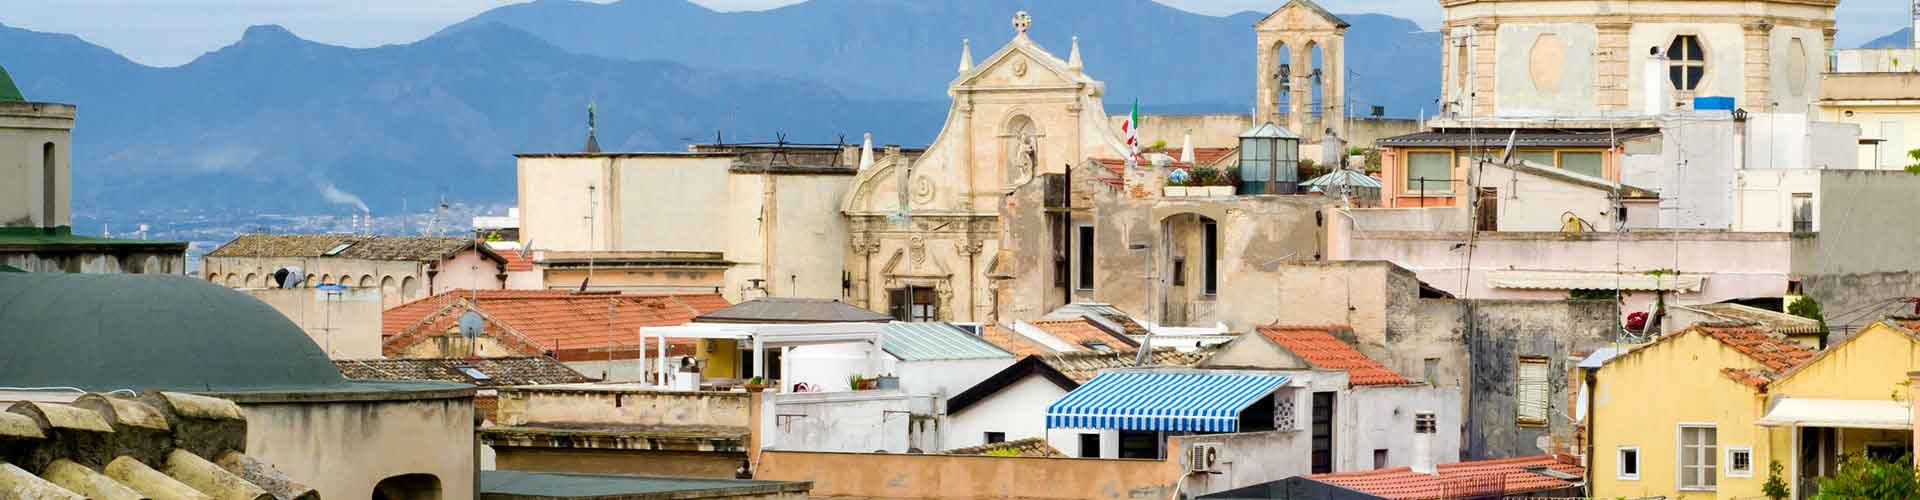 Cagliari - Appartments à Cagliari. Cartes pour Cagliari, photos et commentaires pour chaque appartement à Cagliari.